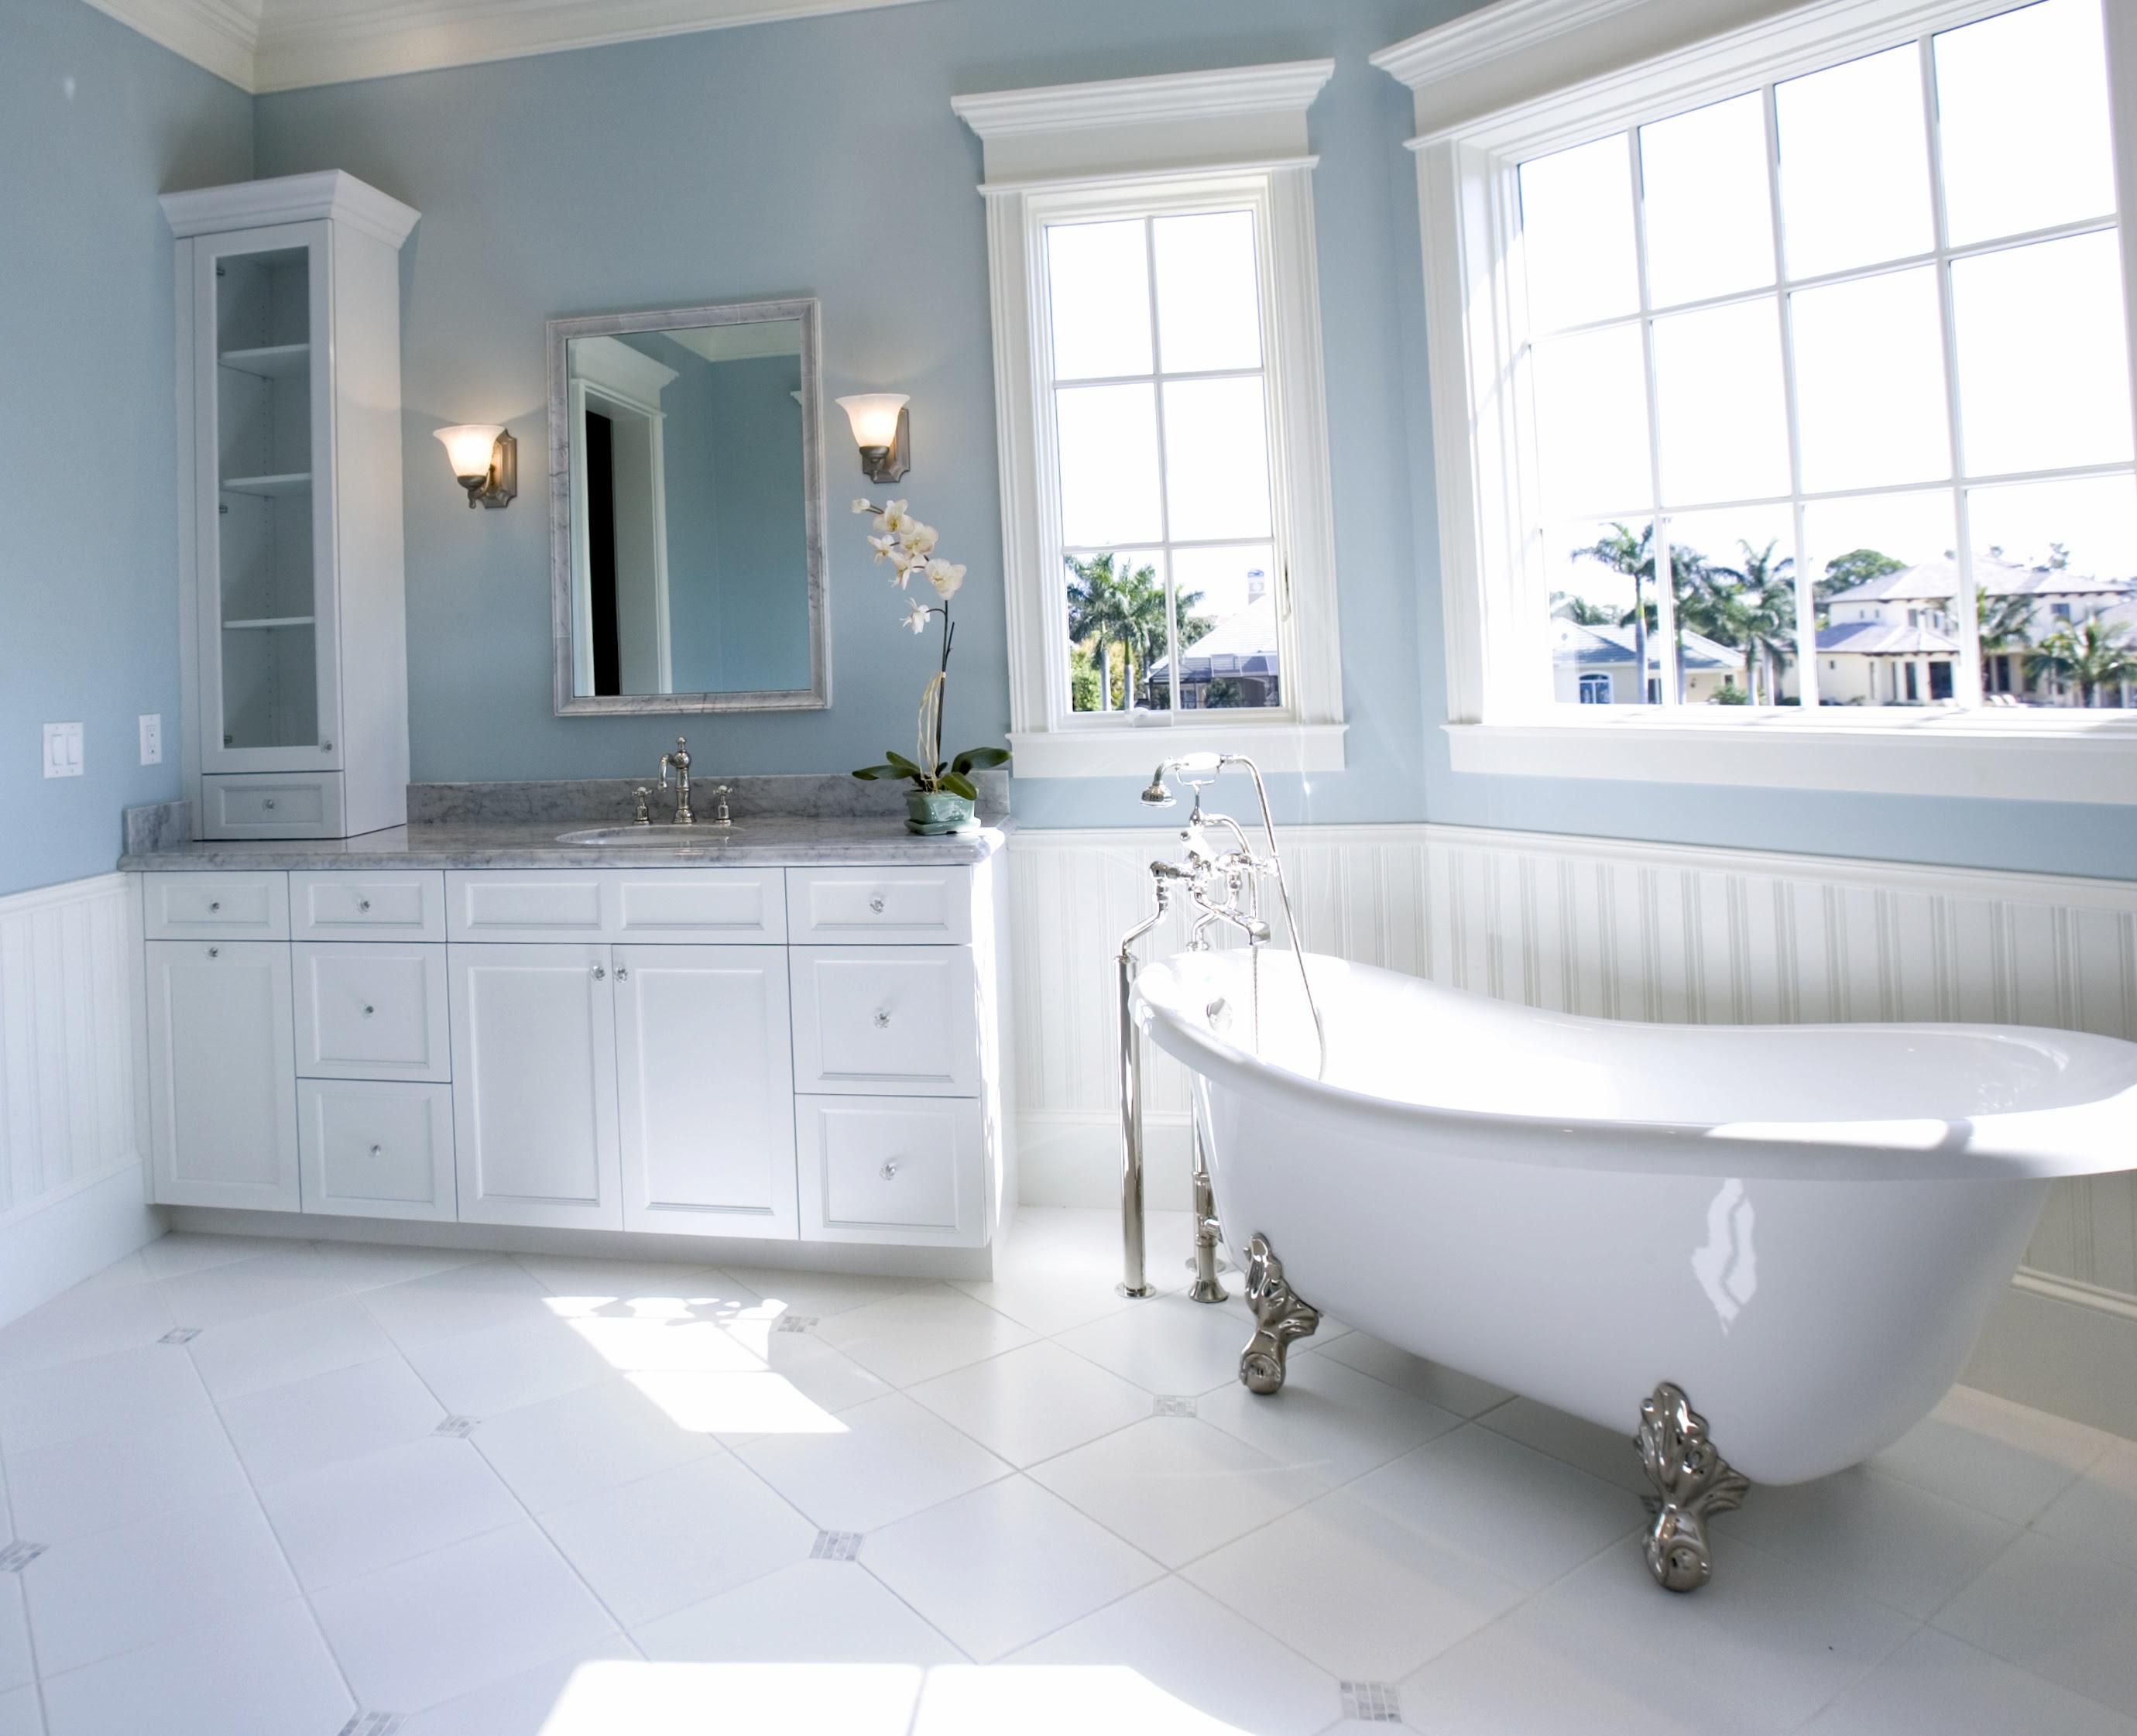 10 benefits of Light blue wall paint colors | Warisan Lighting